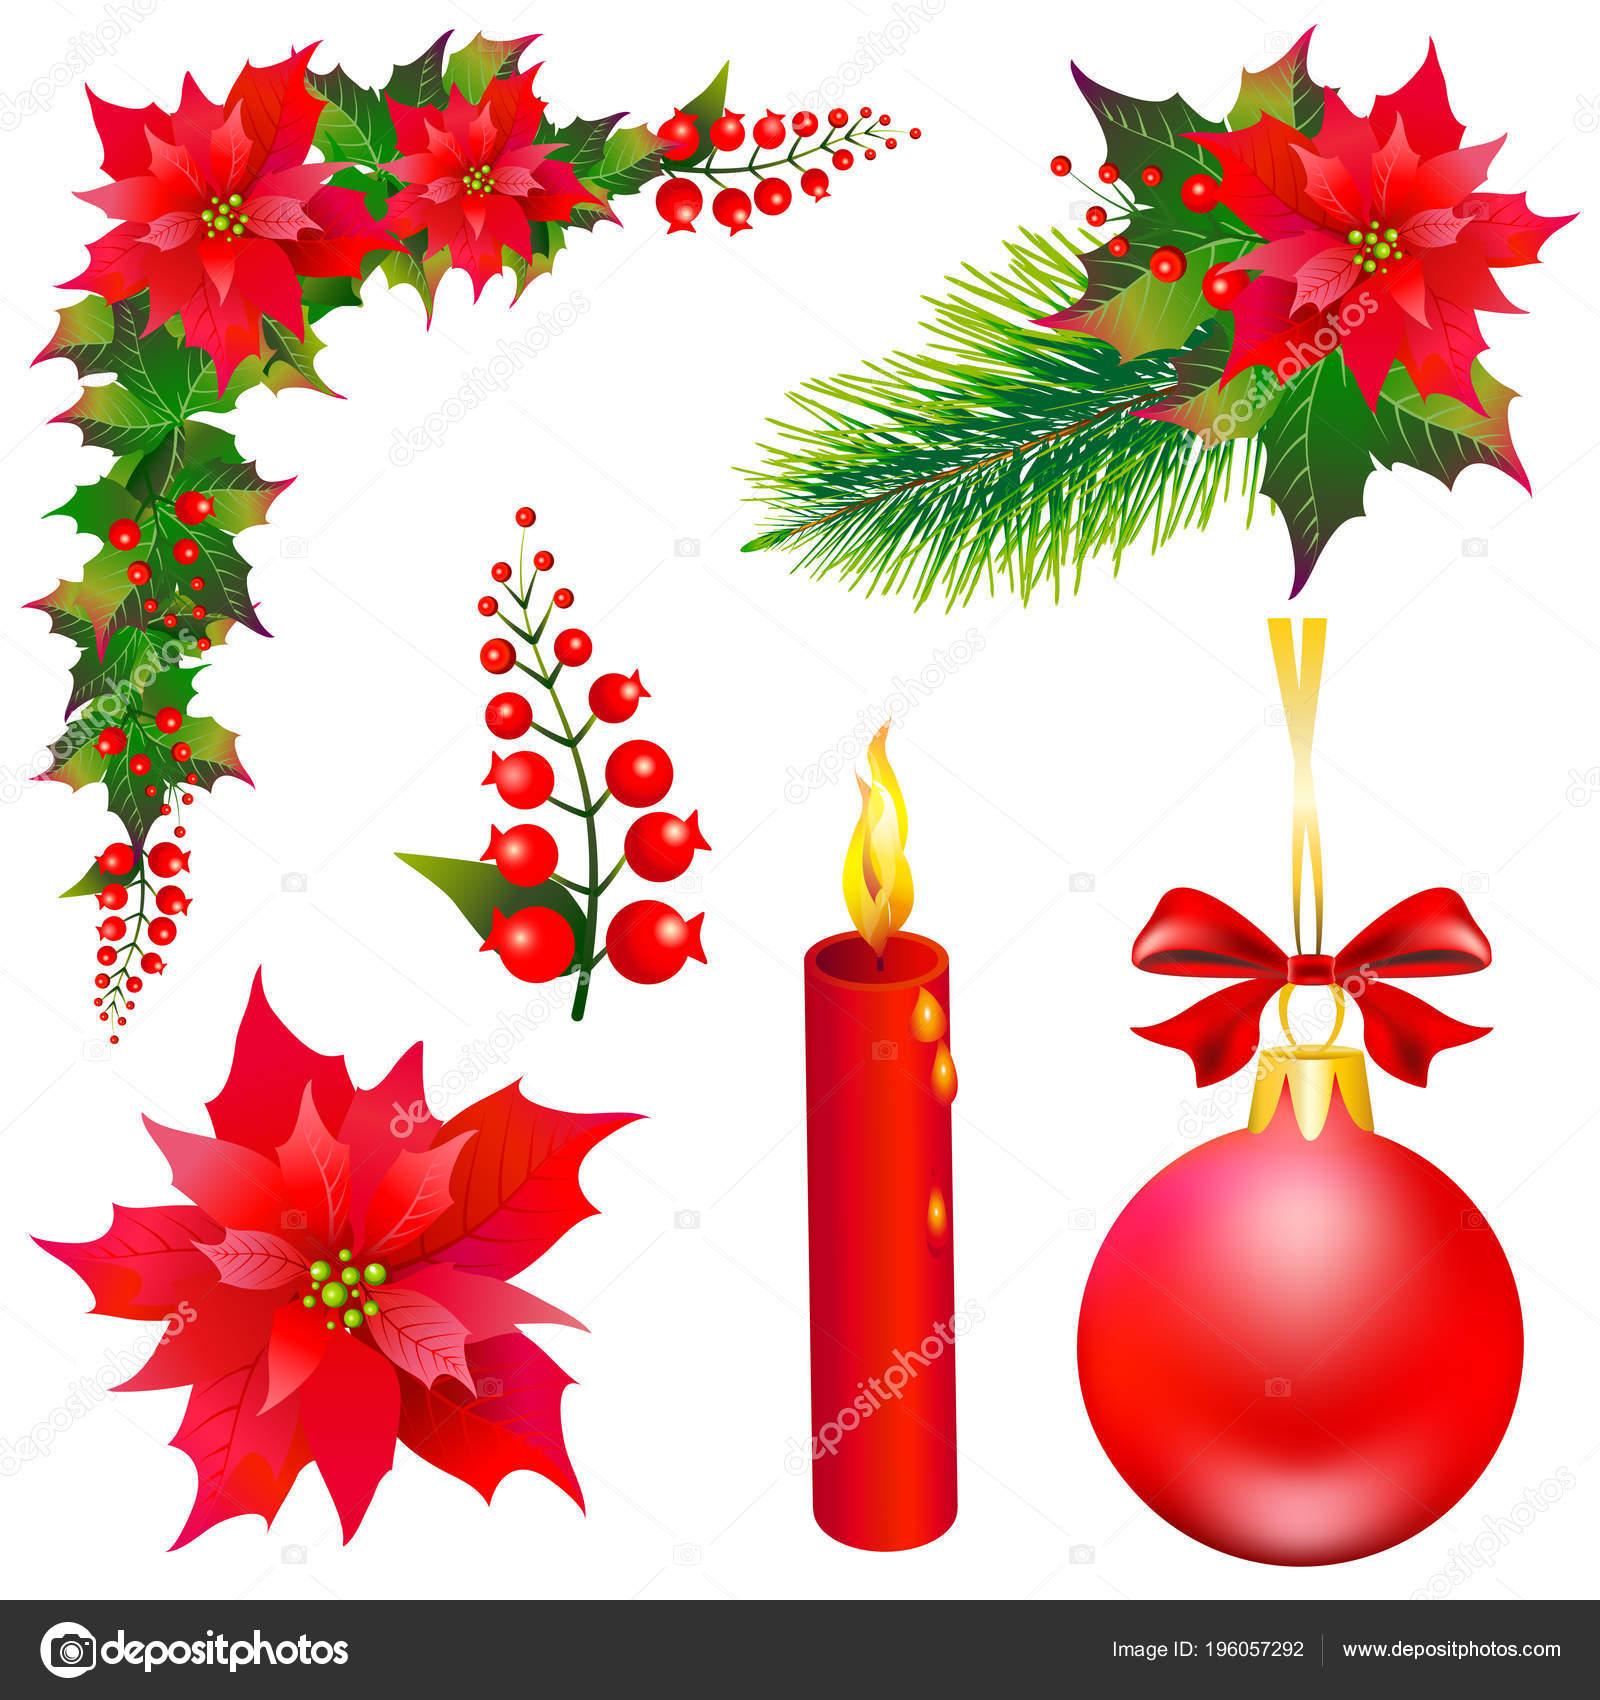 2019 imagenes navidad imagenes navidad fondo for Adornos navidenos 2017 trackid sp 006